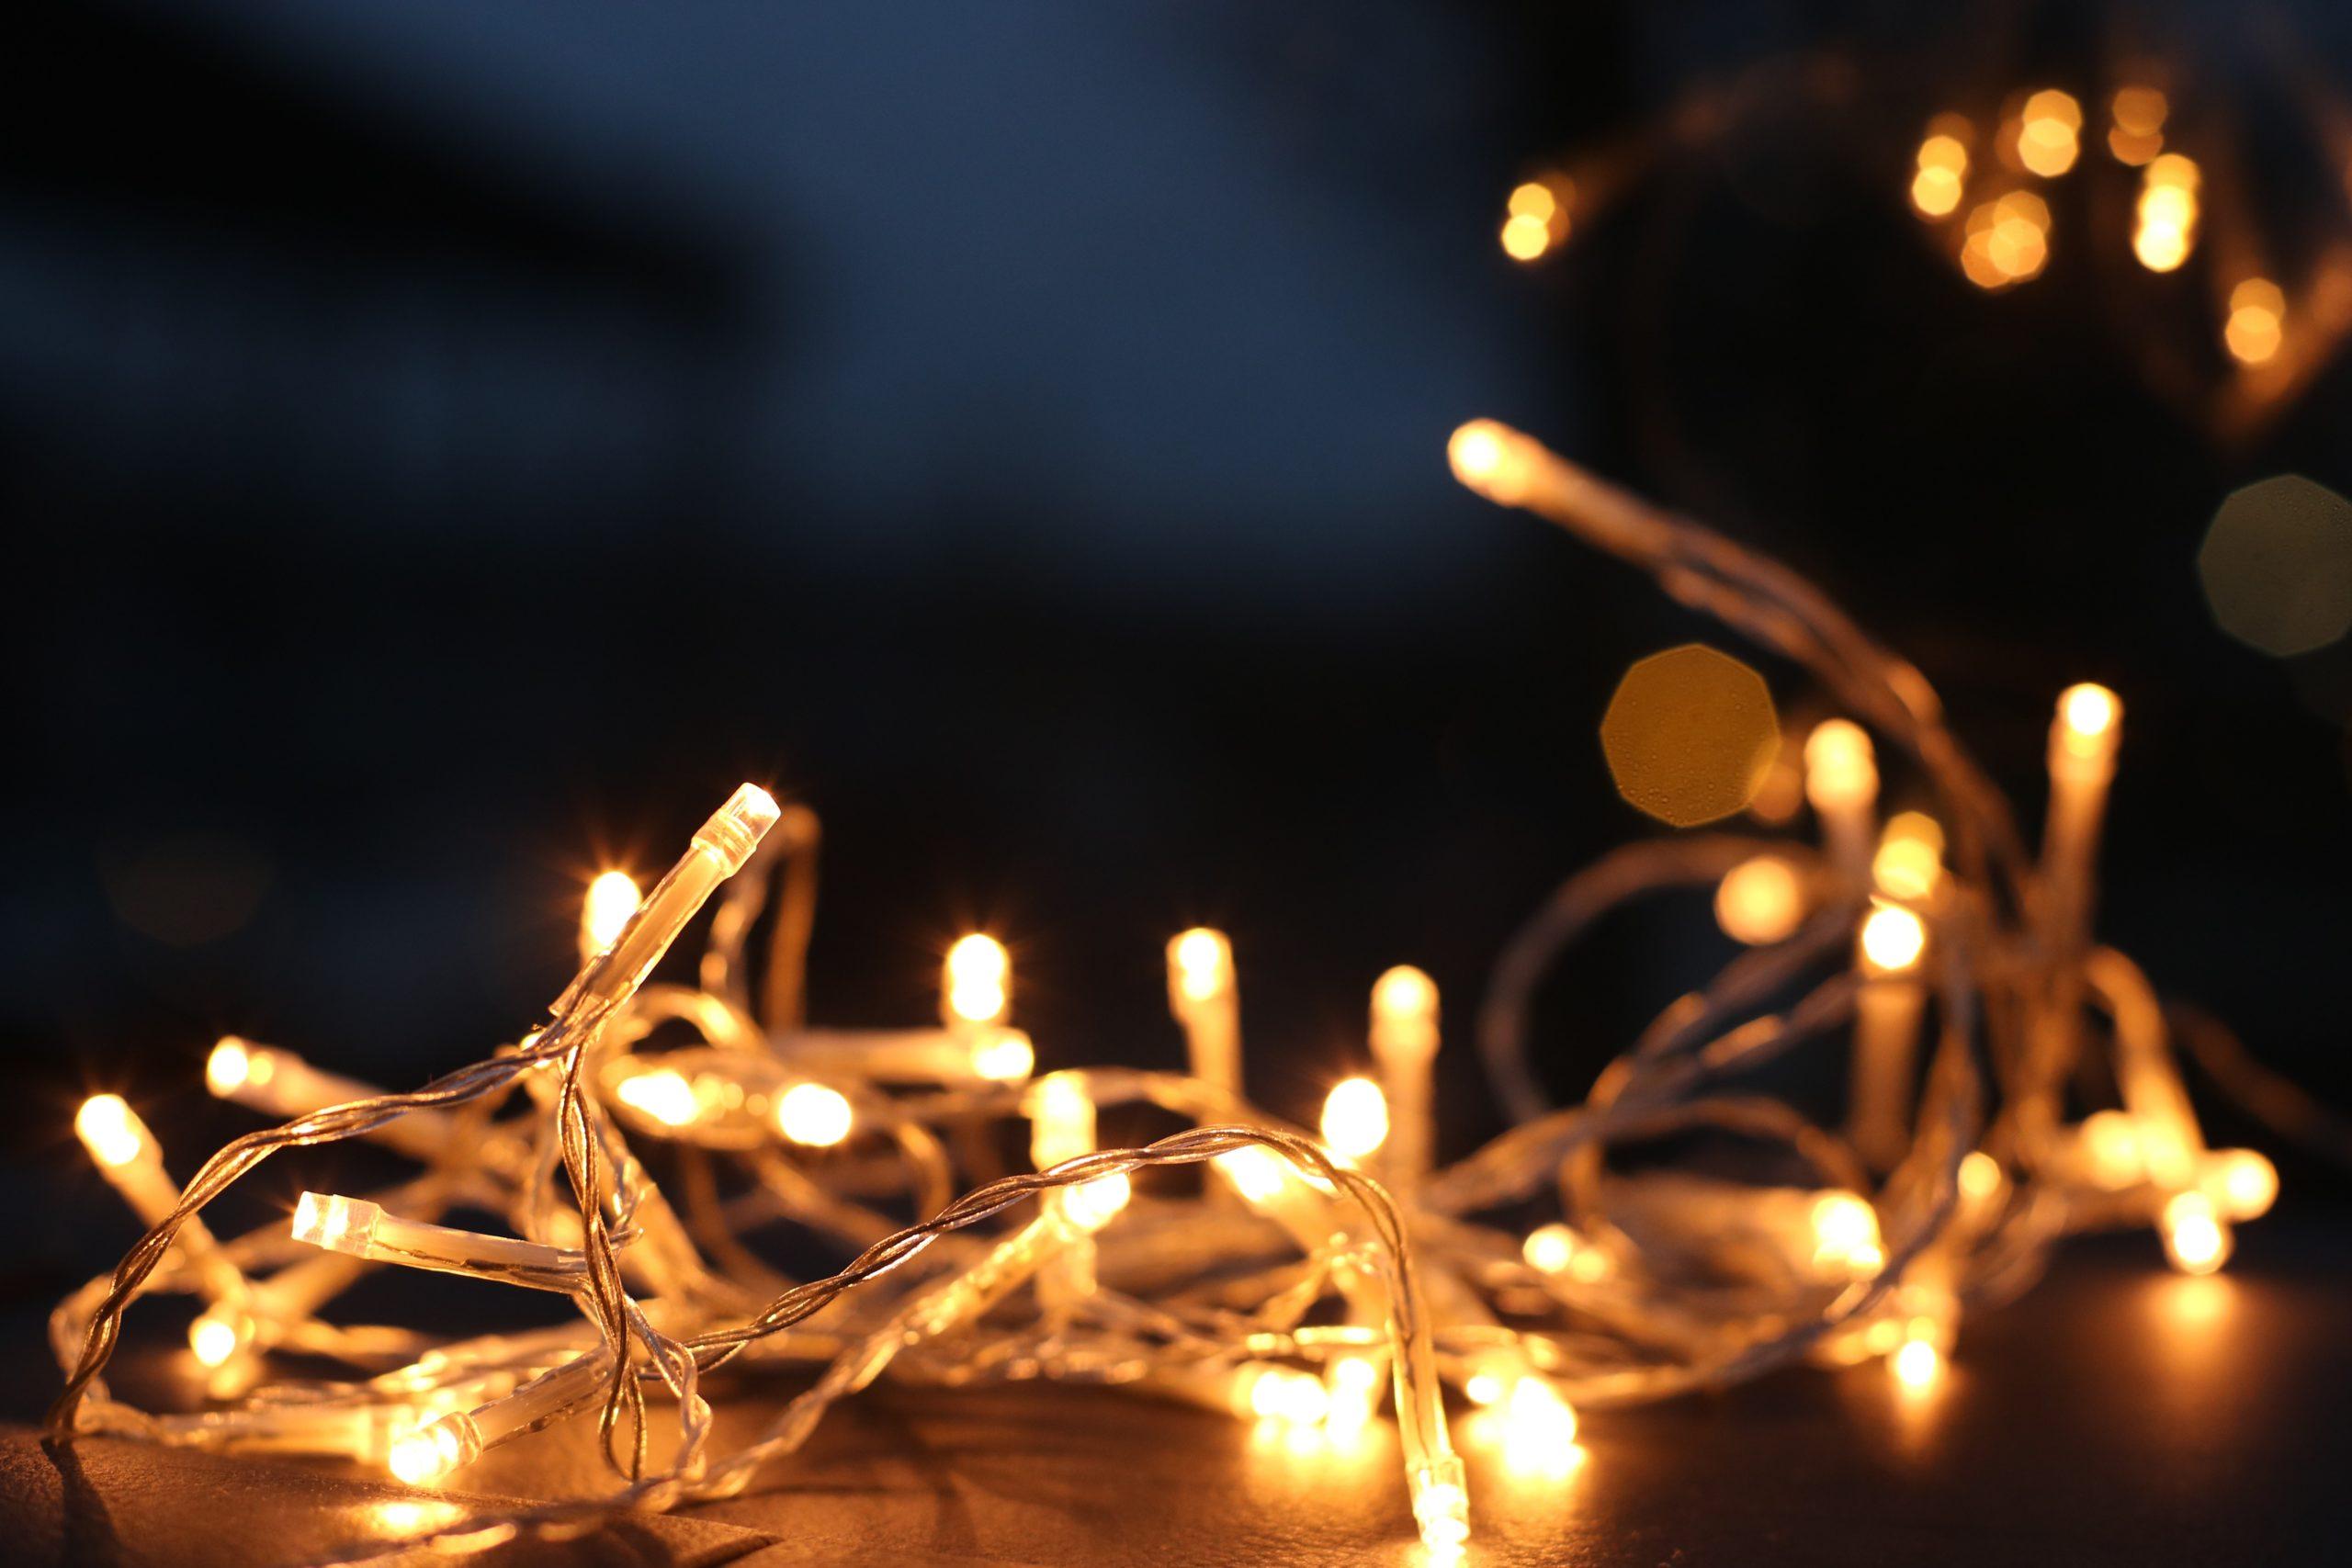 twinkle lights for the fall season decor accessory